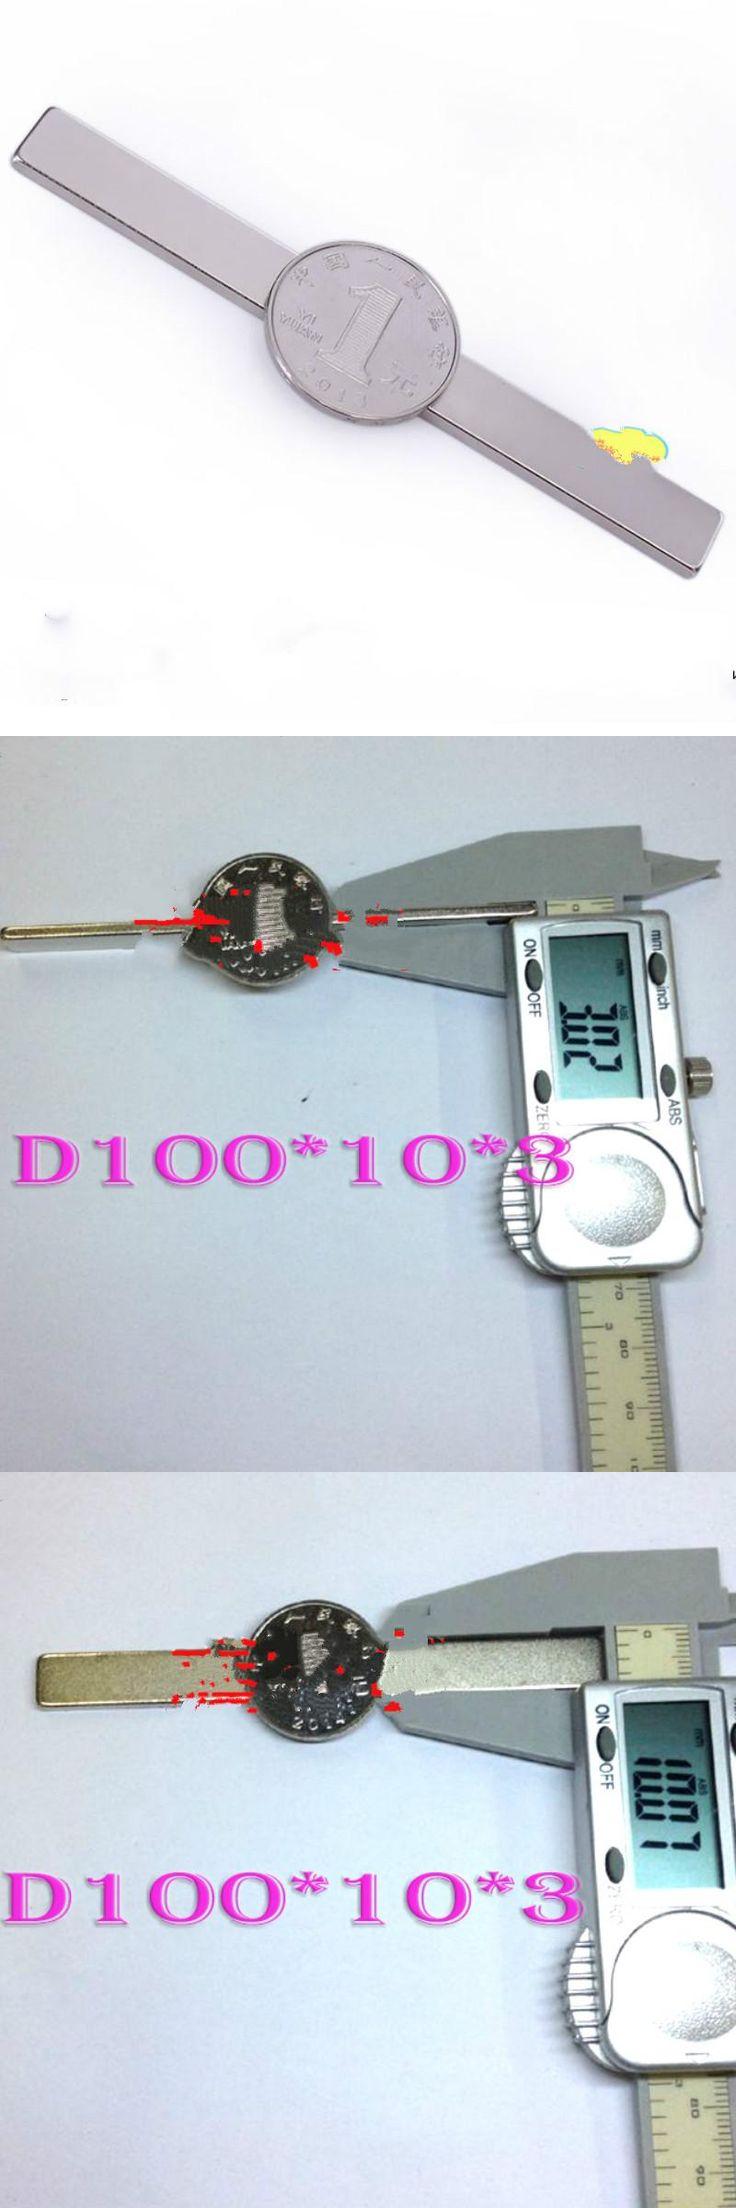 [Visit to Buy] 1pcs 100mm x 10mm x 3mm Super Powerful Rare Earth Neodymium Magnets 100*10*3mm Rectangular Strip Magnet Craft Magnetite #Advertisement